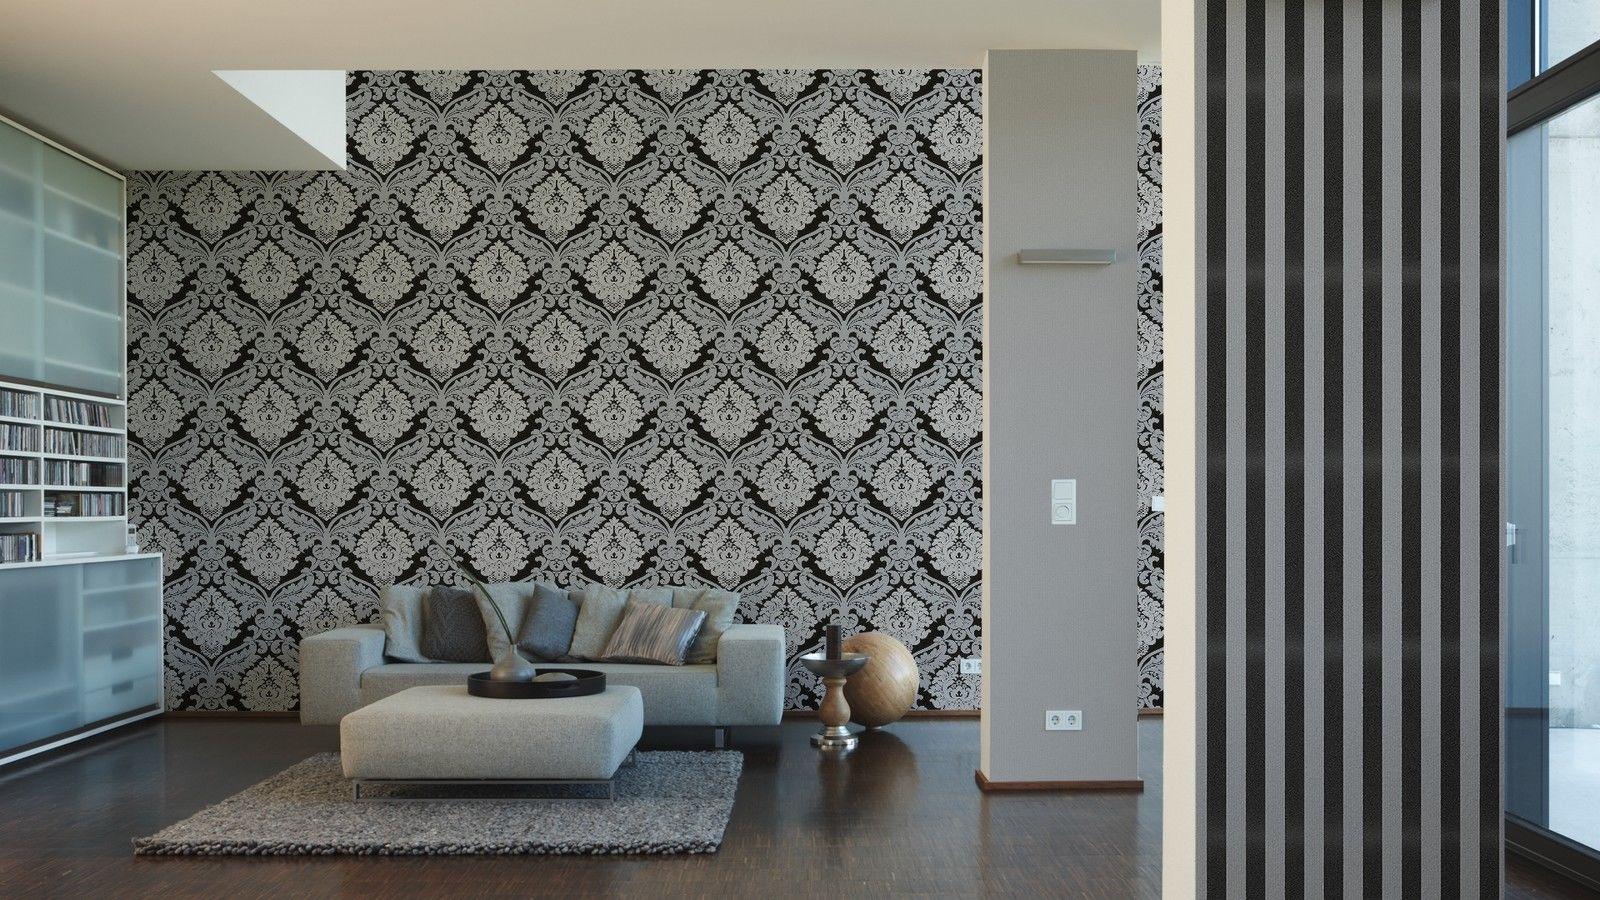 vlies tapete barock muster ornament schwarz grau glitzer effekt klassisch kaufen bei joratrend. Black Bedroom Furniture Sets. Home Design Ideas